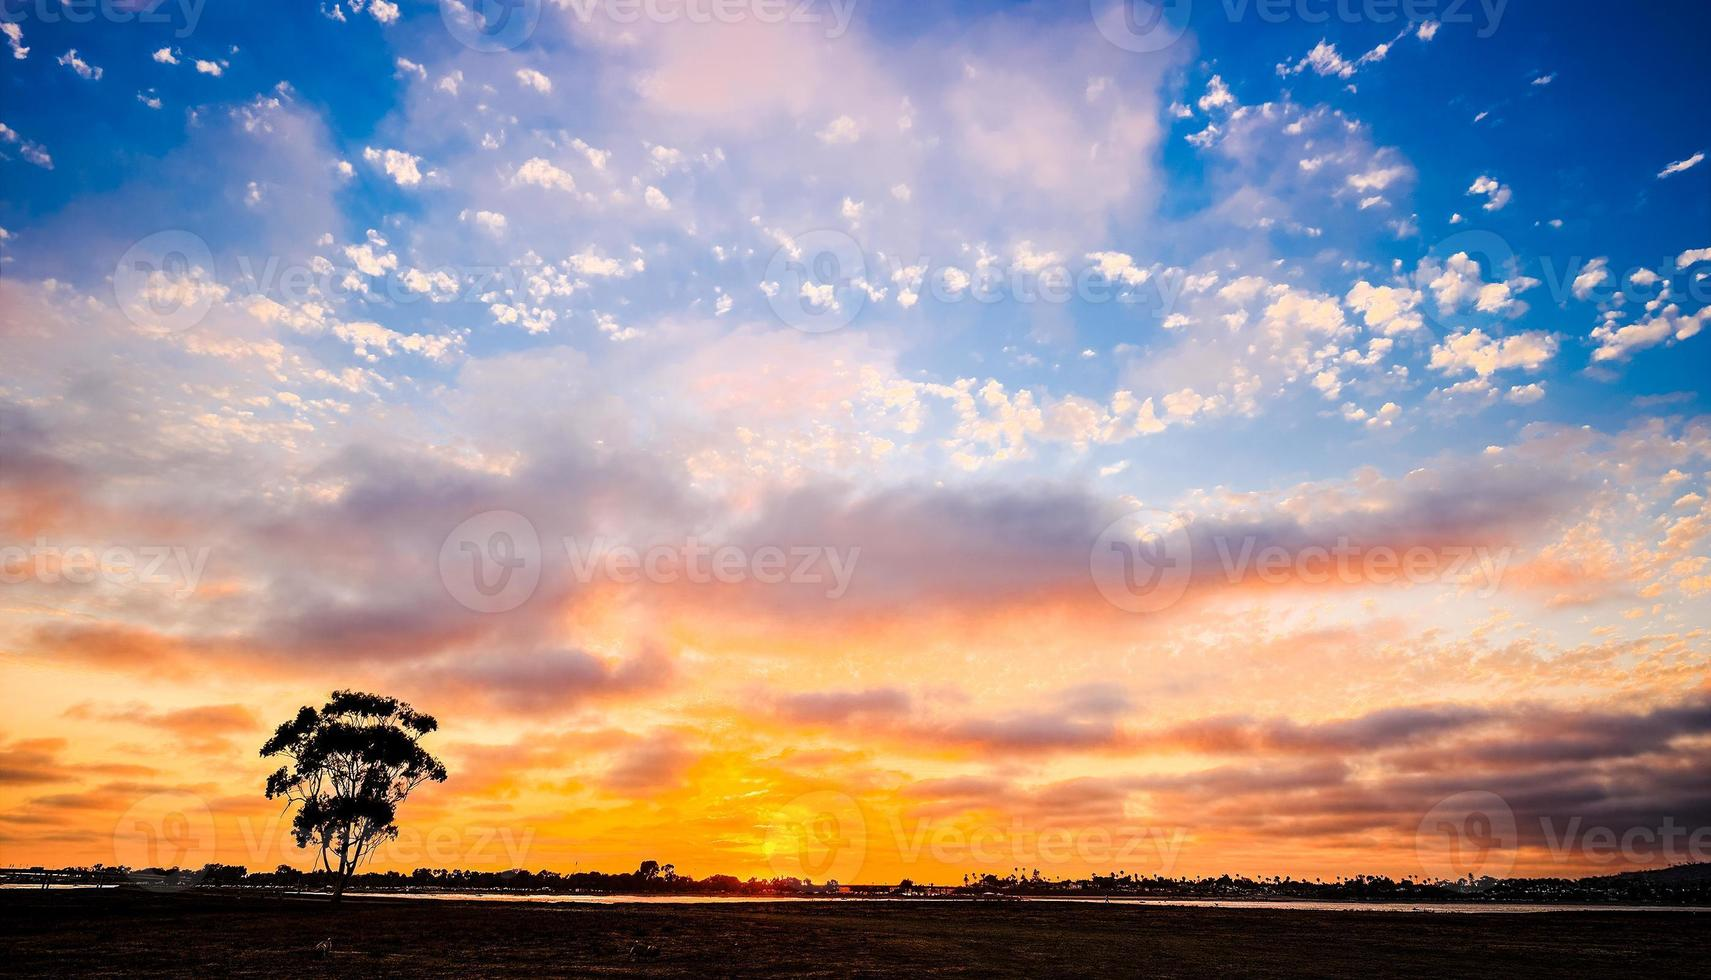 Mission Bay solnedgång. san diego, california usa. foto